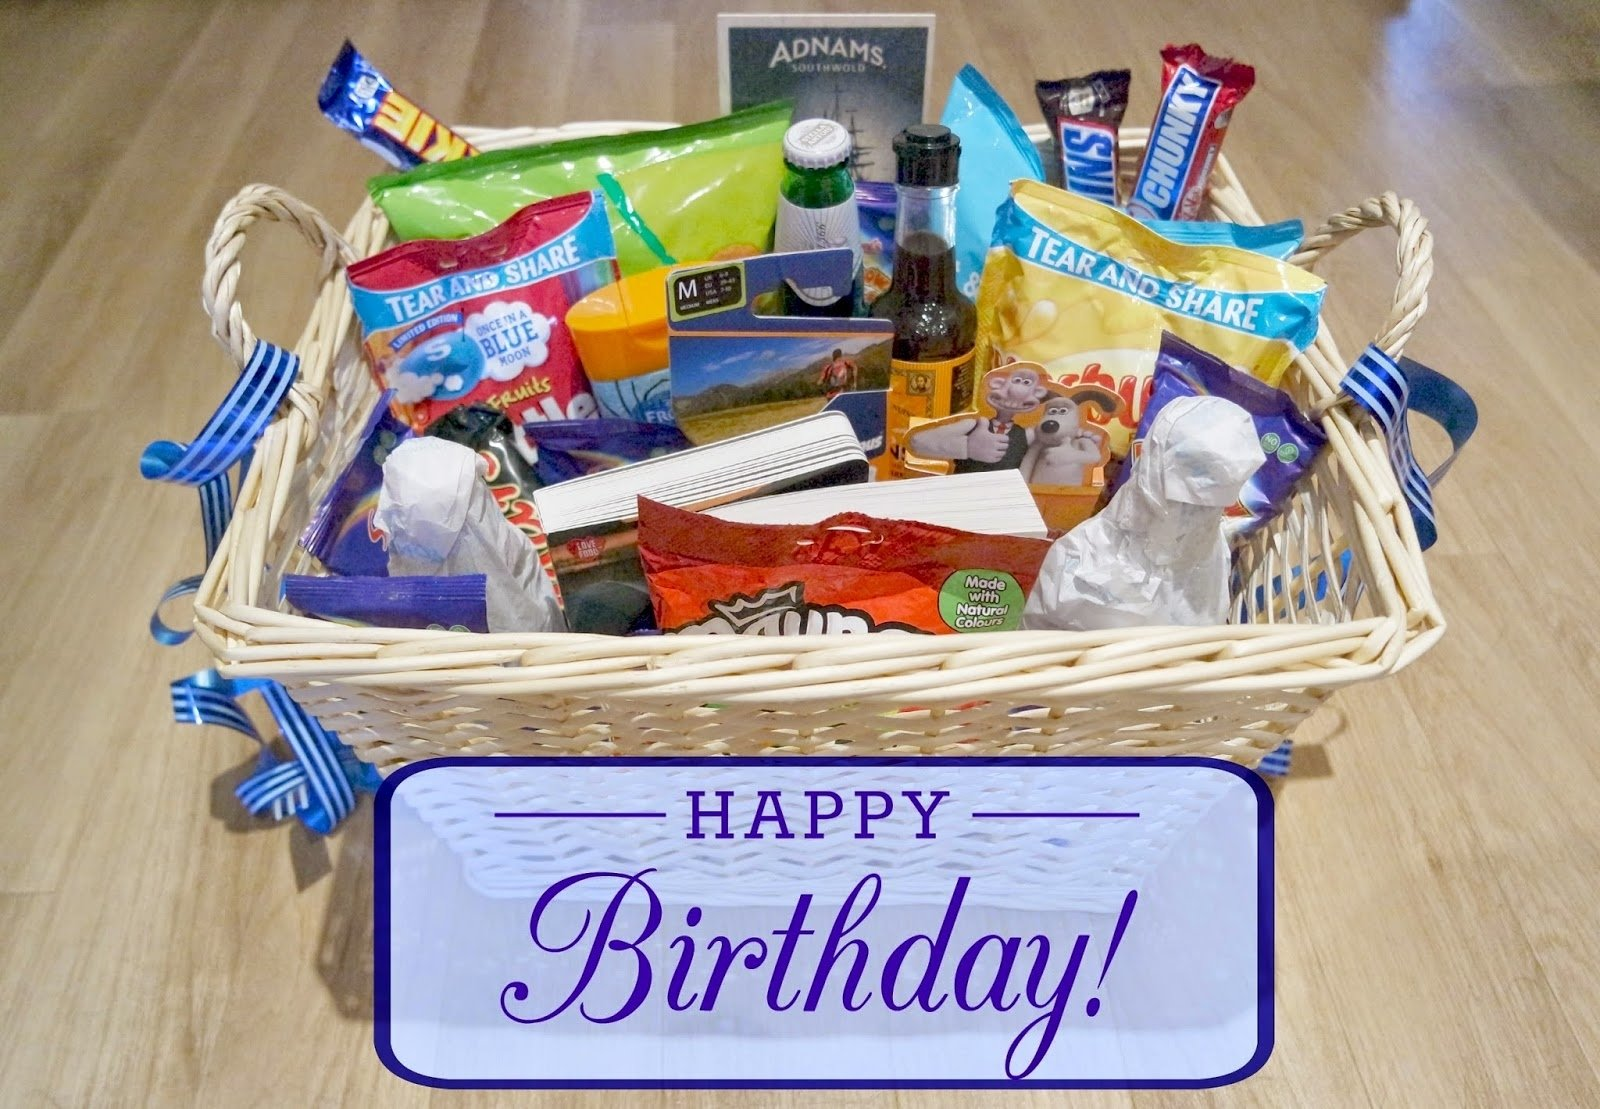 10 Trendy 50 Birthday Ideas For Men uptown peach my dads 50th birthday hamper mens gift ideas 15 2021